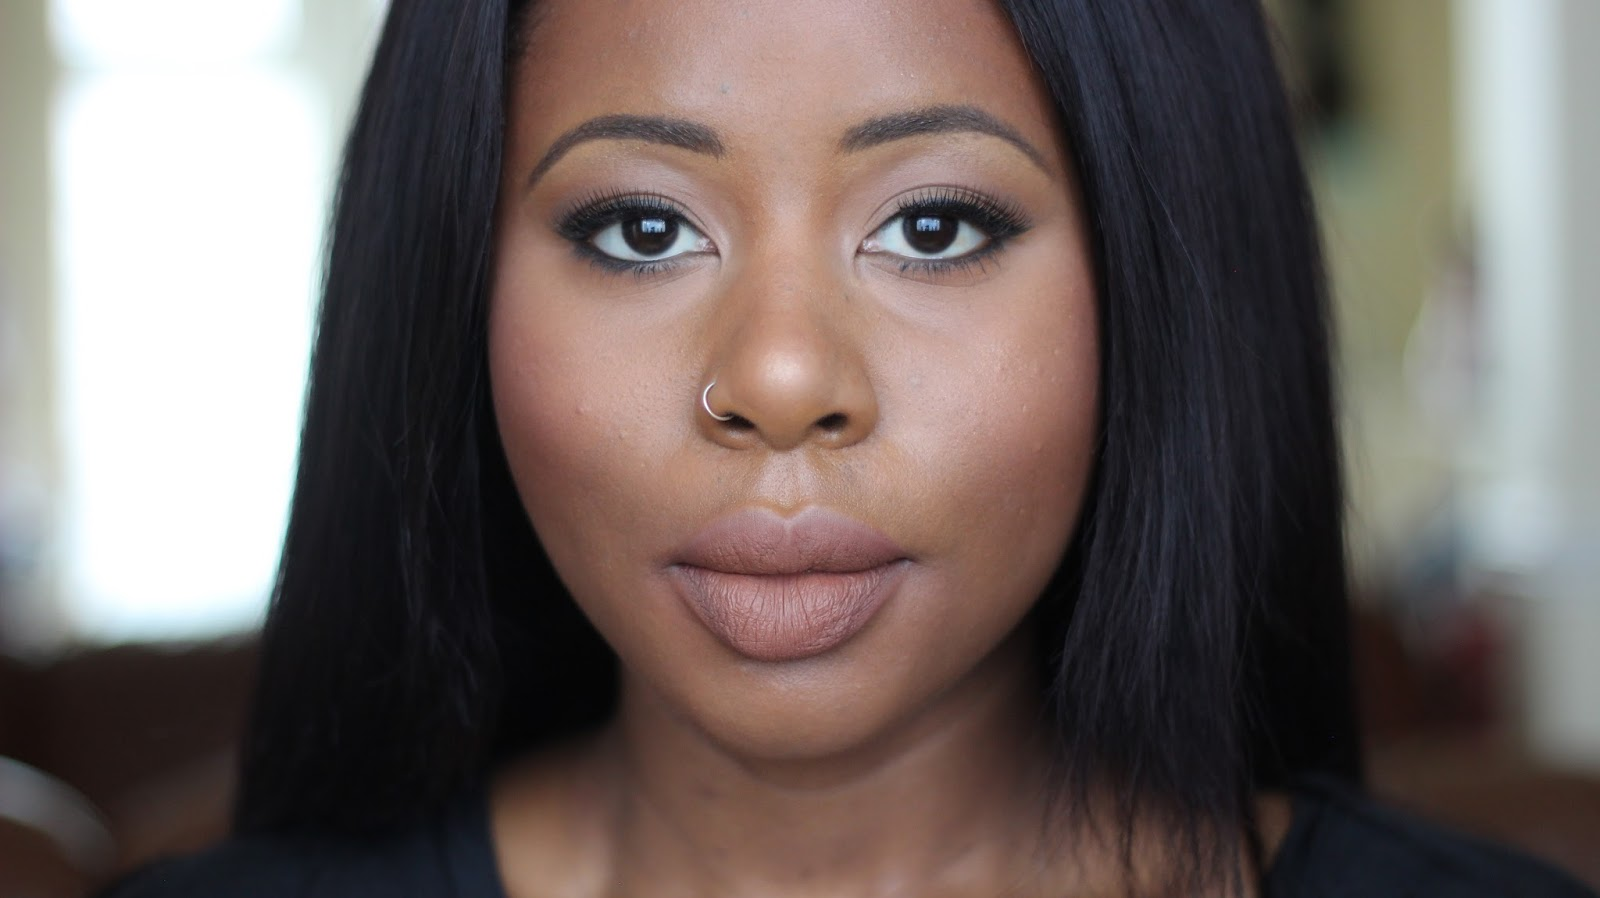 makeup monsters cosmetics nude lips liquid lipstick just add marshmallow nc50 natalie kayo discoveriesofself deep skin dark skin woc black beauty blogger